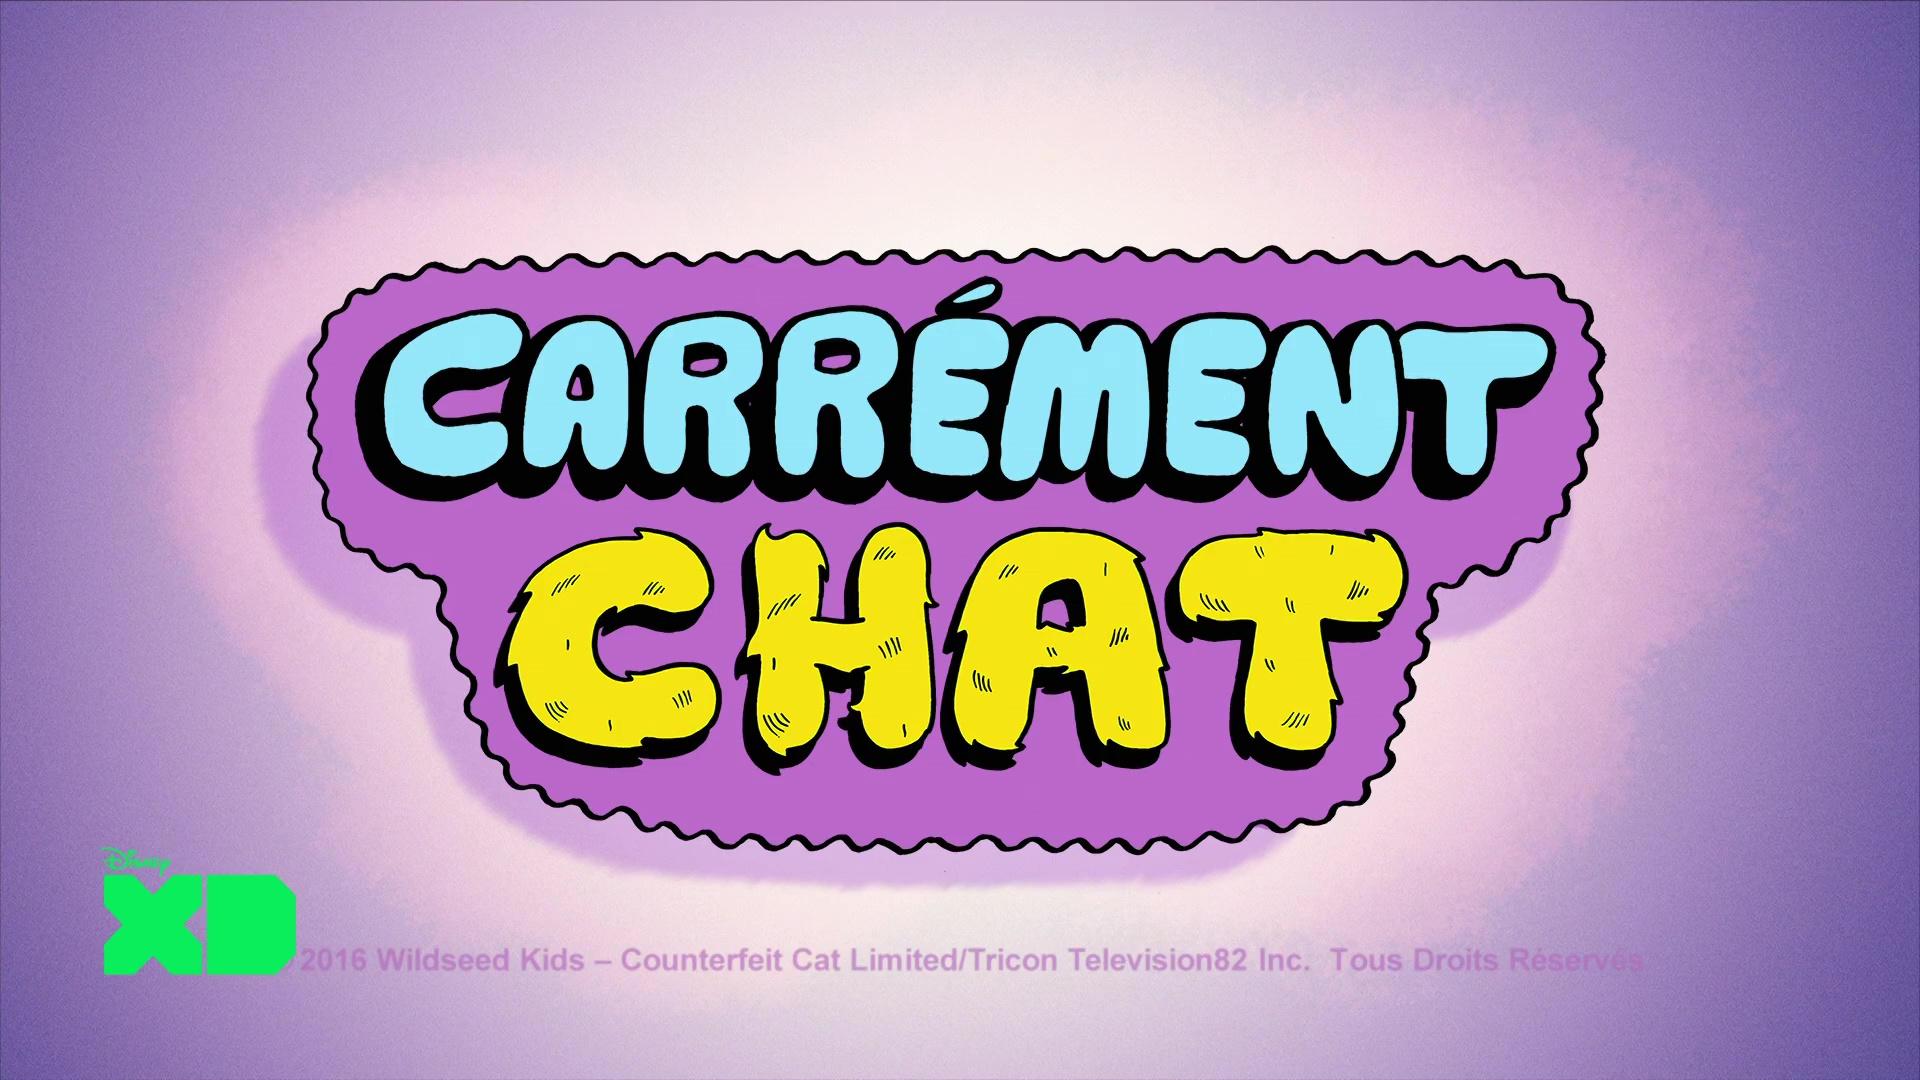 Disney XD carrement chat